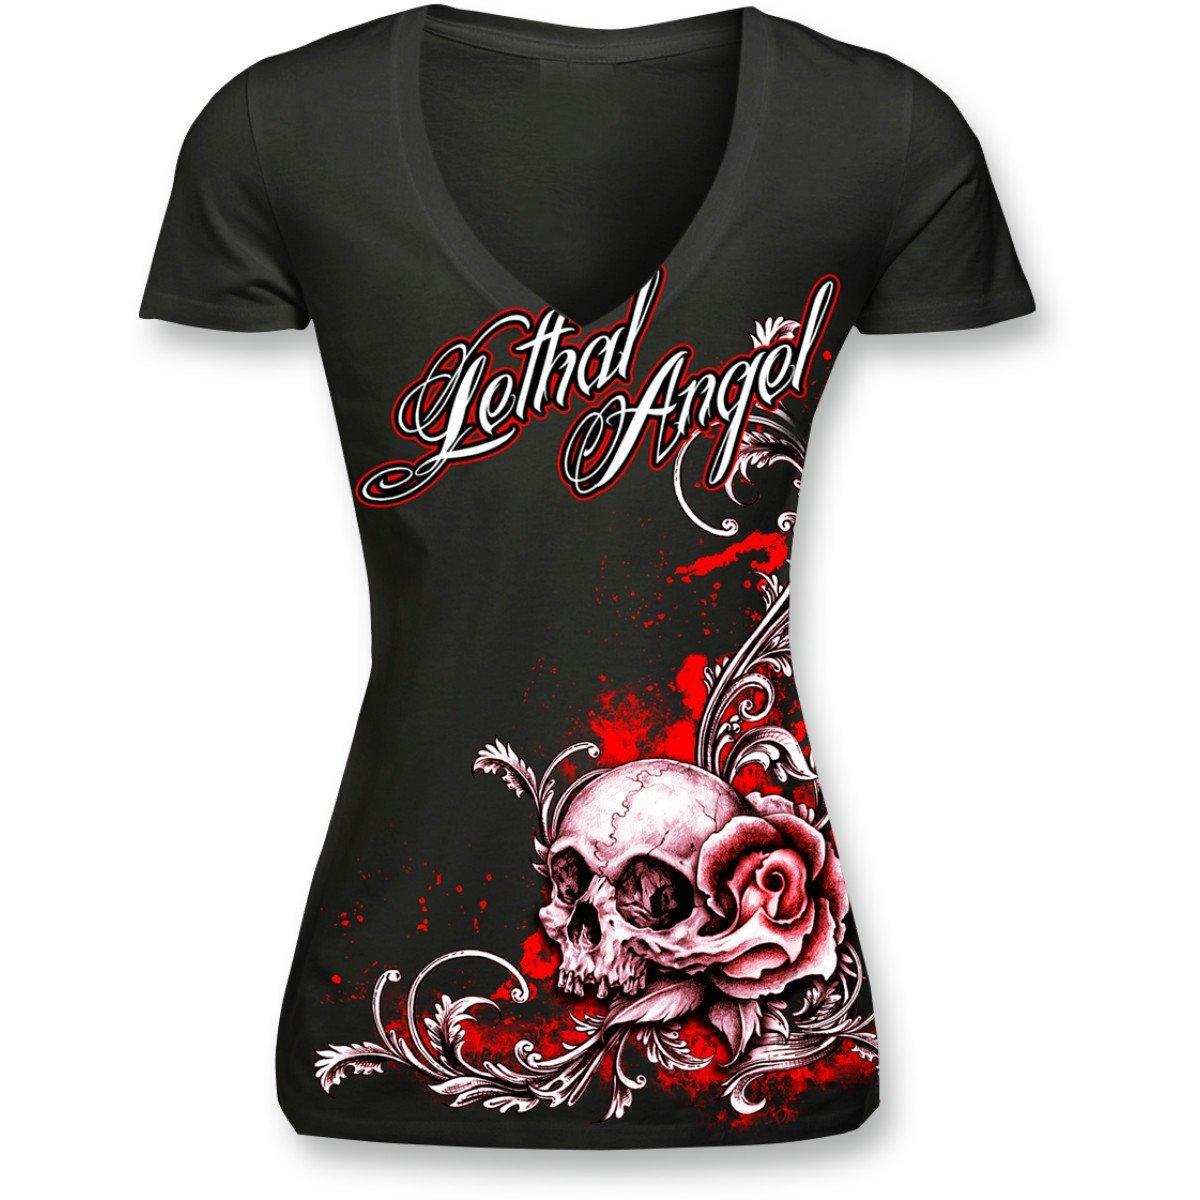 Lethal Threat (LT20288S) Women's Lethal Angel Floral Skull V-Neck T-Shirt (Black/Red, Small)